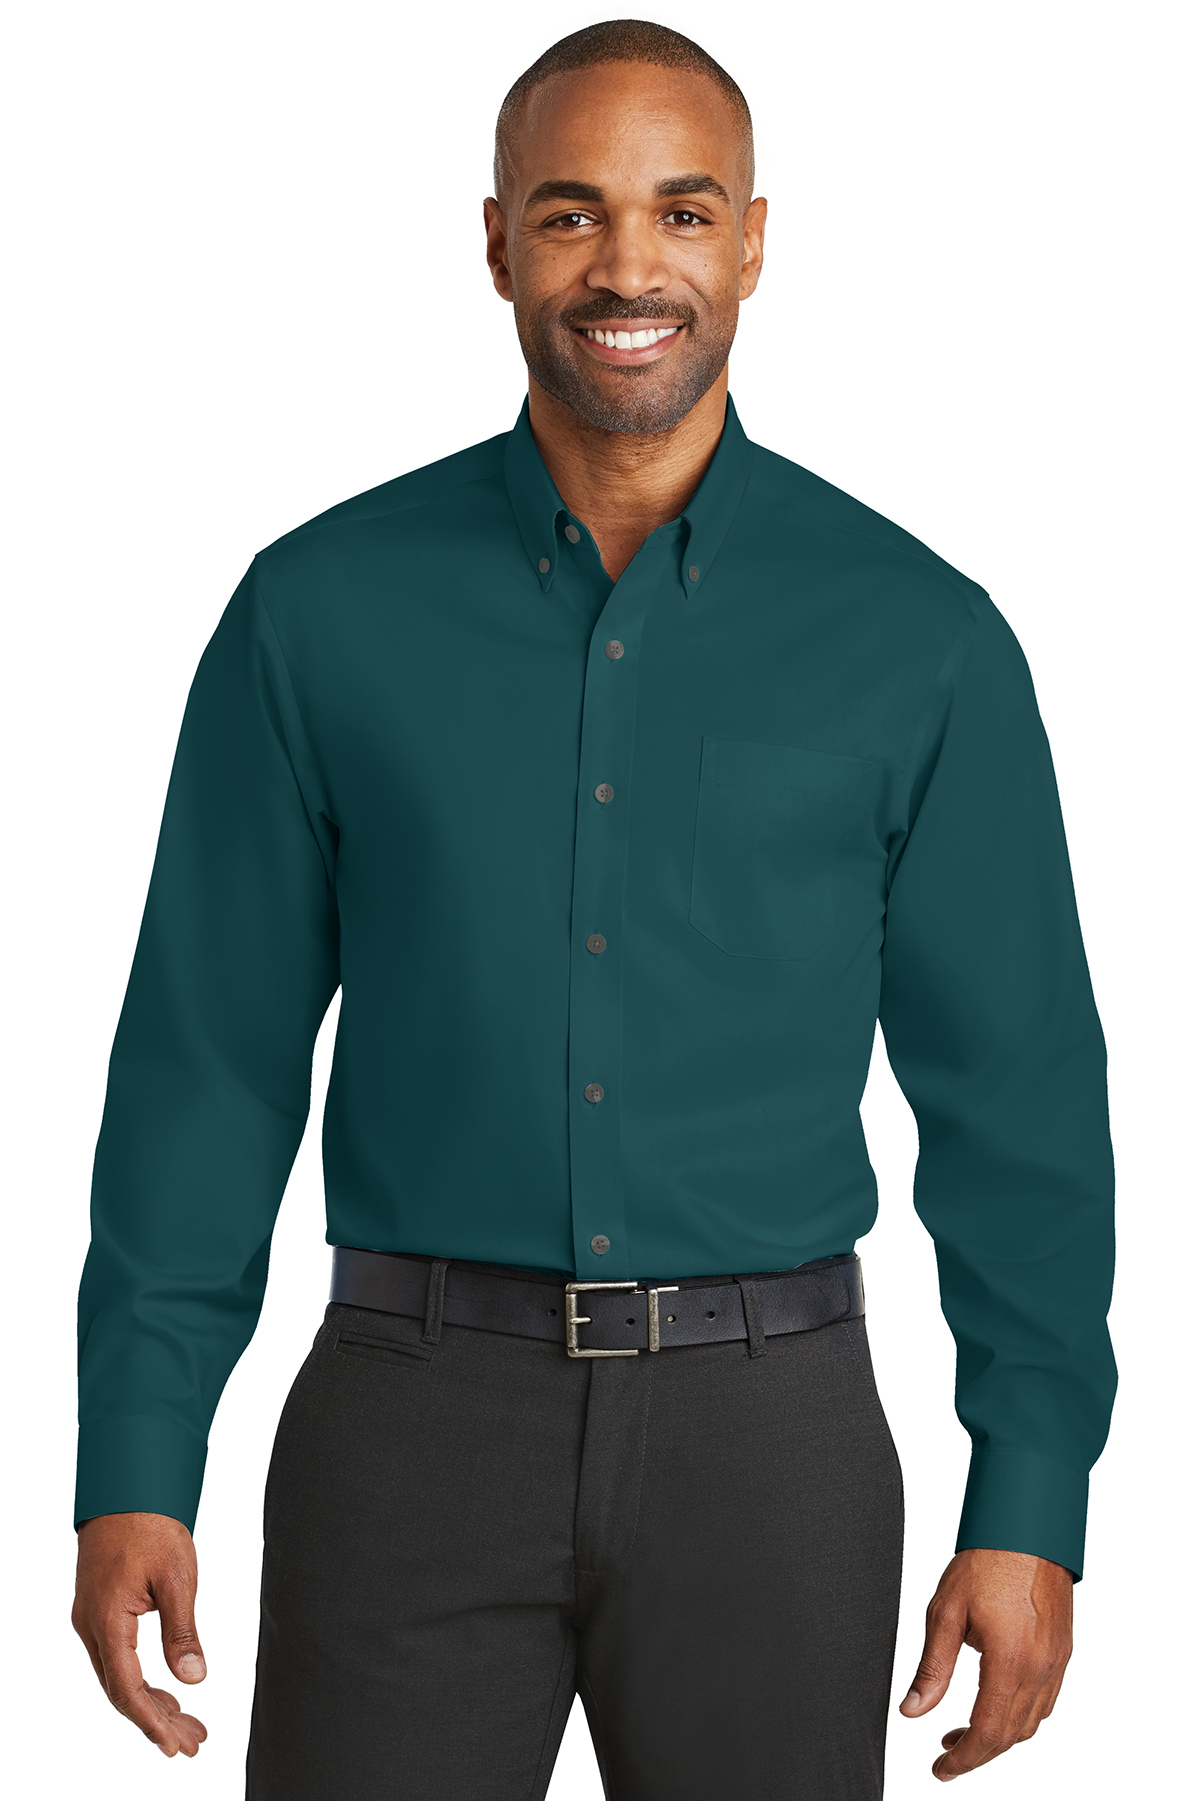 Red House Mini-Check Non-Iron Button-Down Shirts XS Black